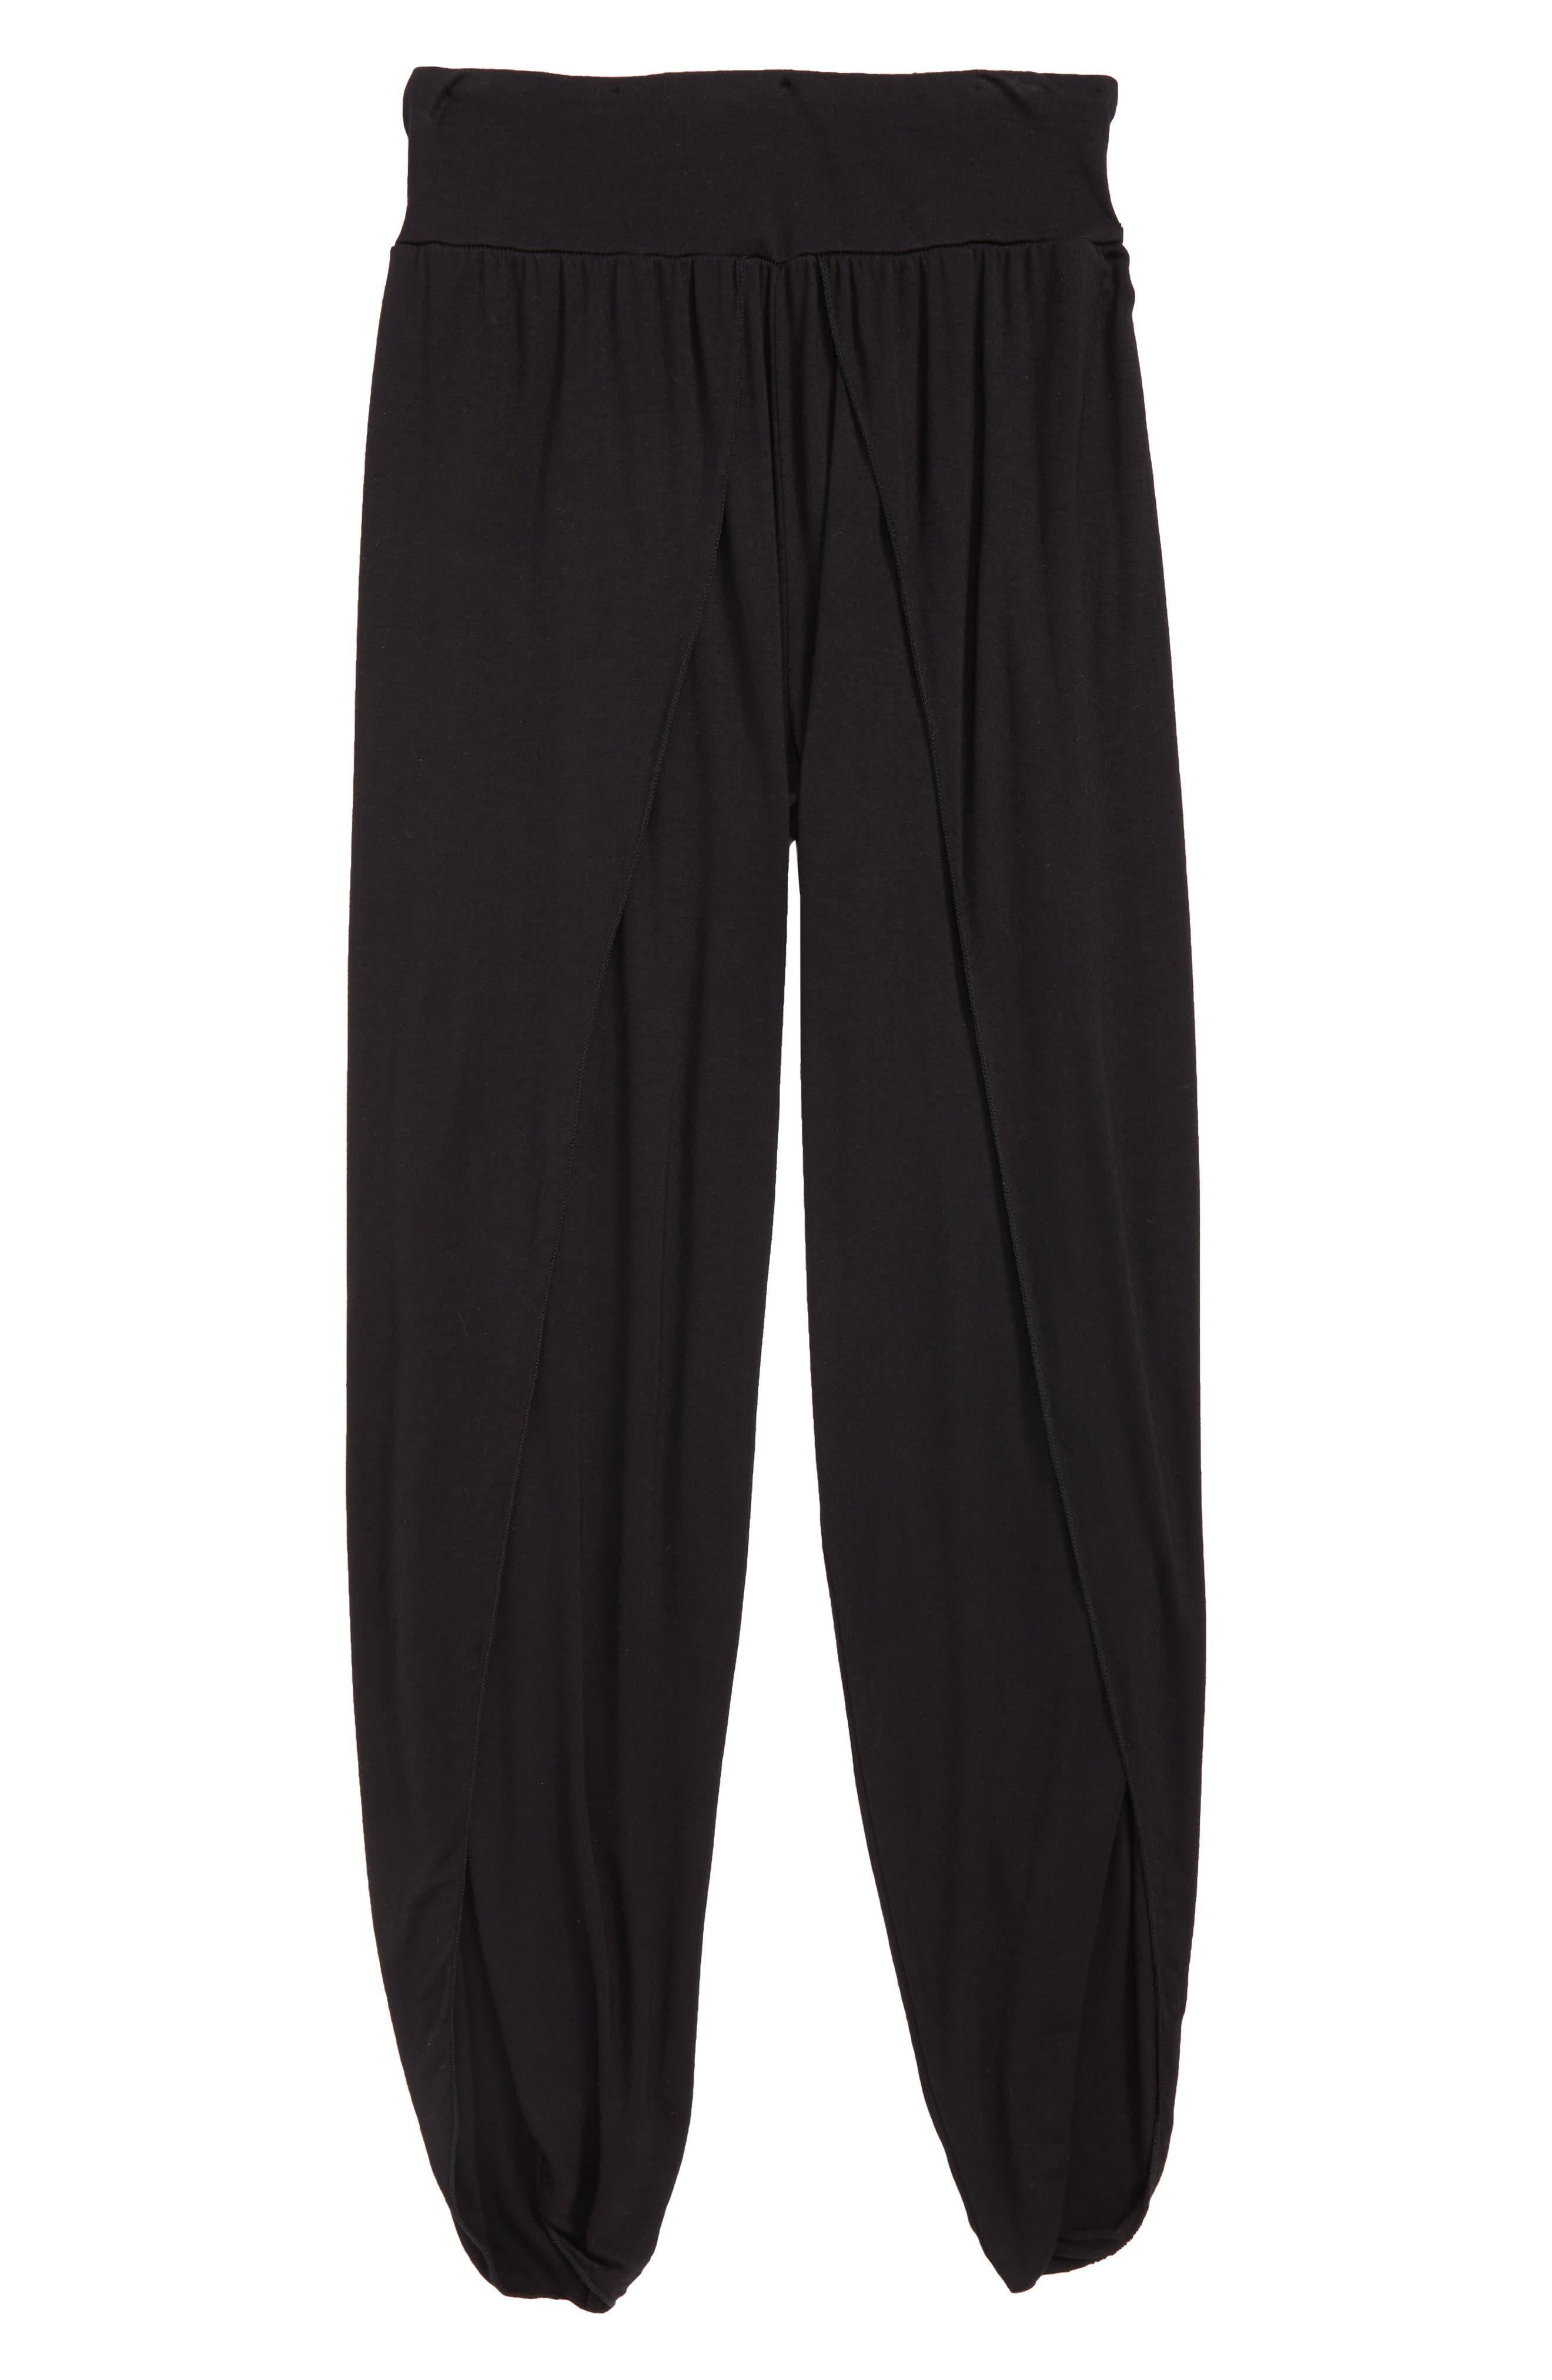 Briana Flutter Pants,                         Main,                         color, Black